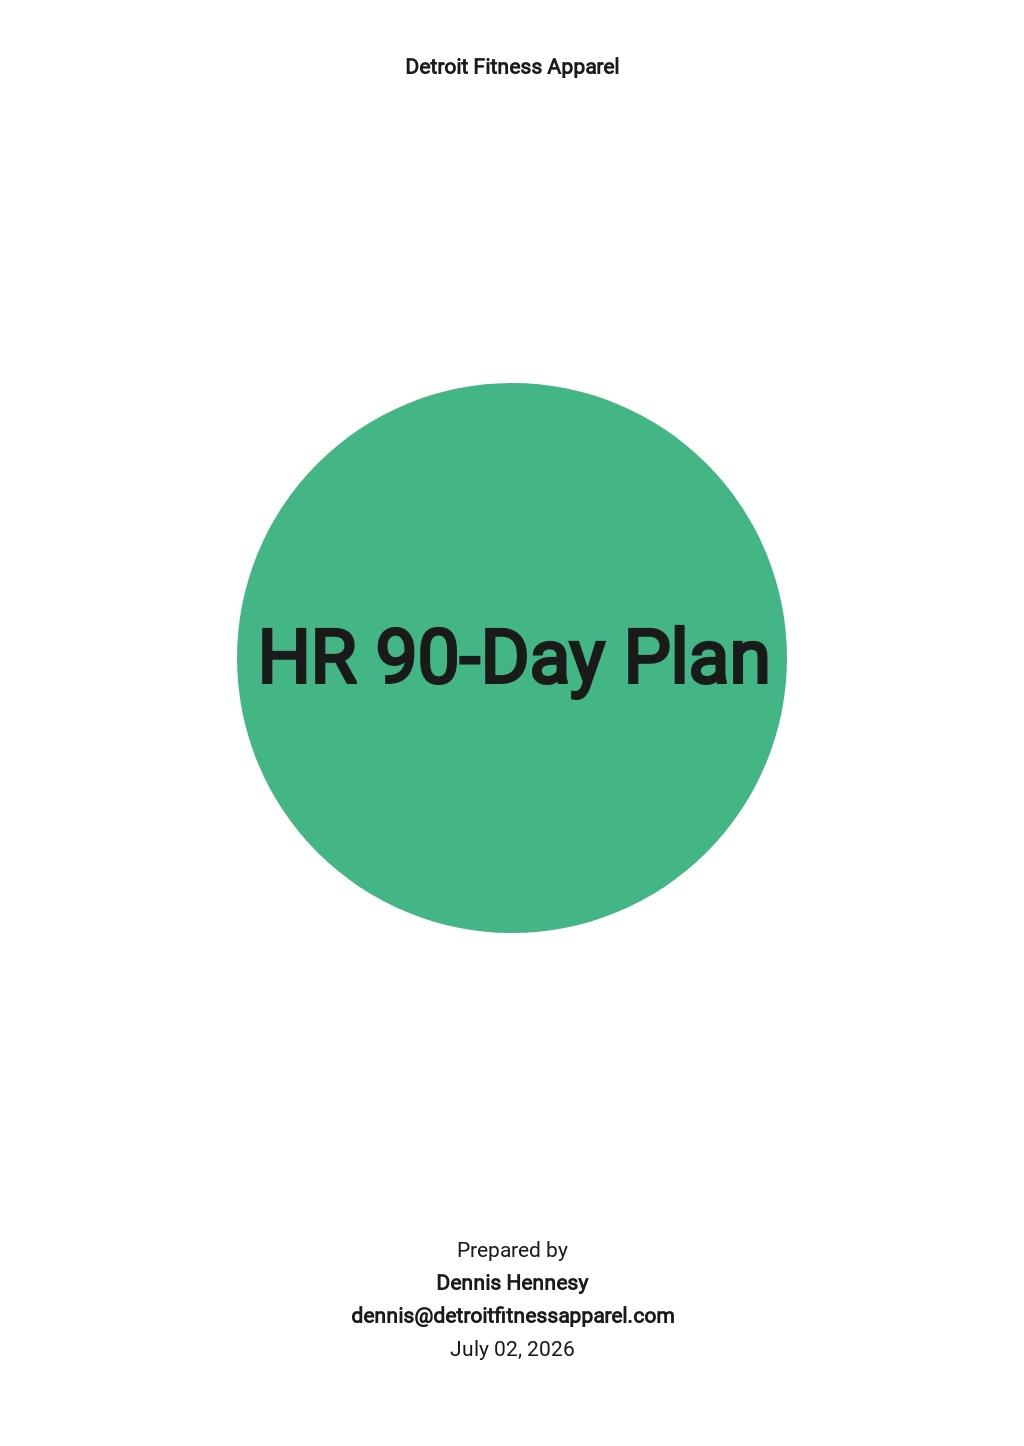 HR 90-Day Plan Template